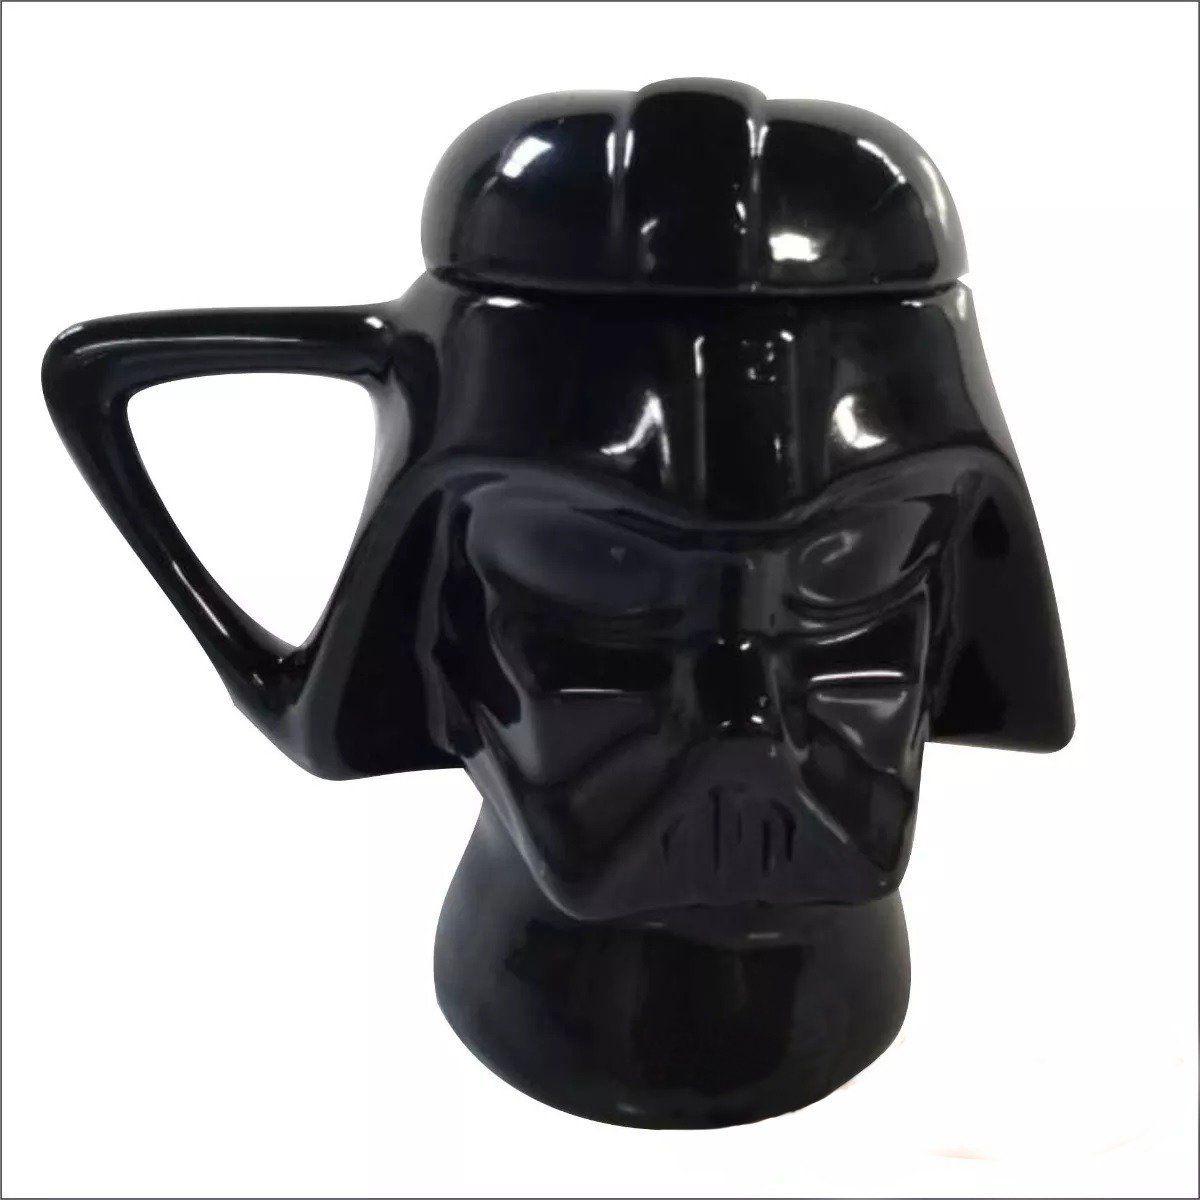 Caneca com Tampa Capacete Darth Vader: Star Wars